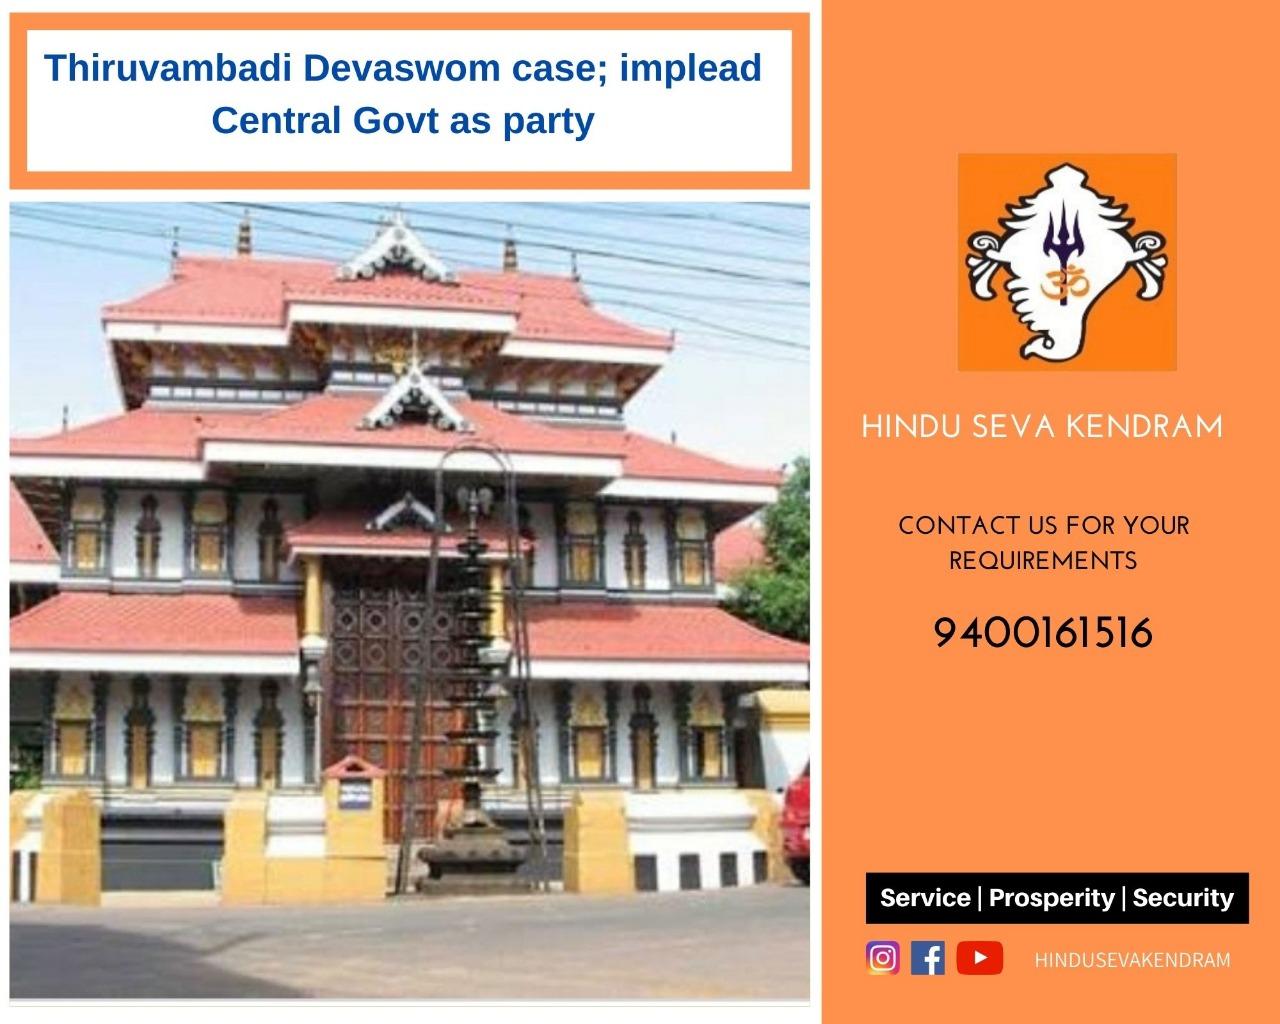 Thiruvambadi Devaswom Case; Implead Central Govt as Party